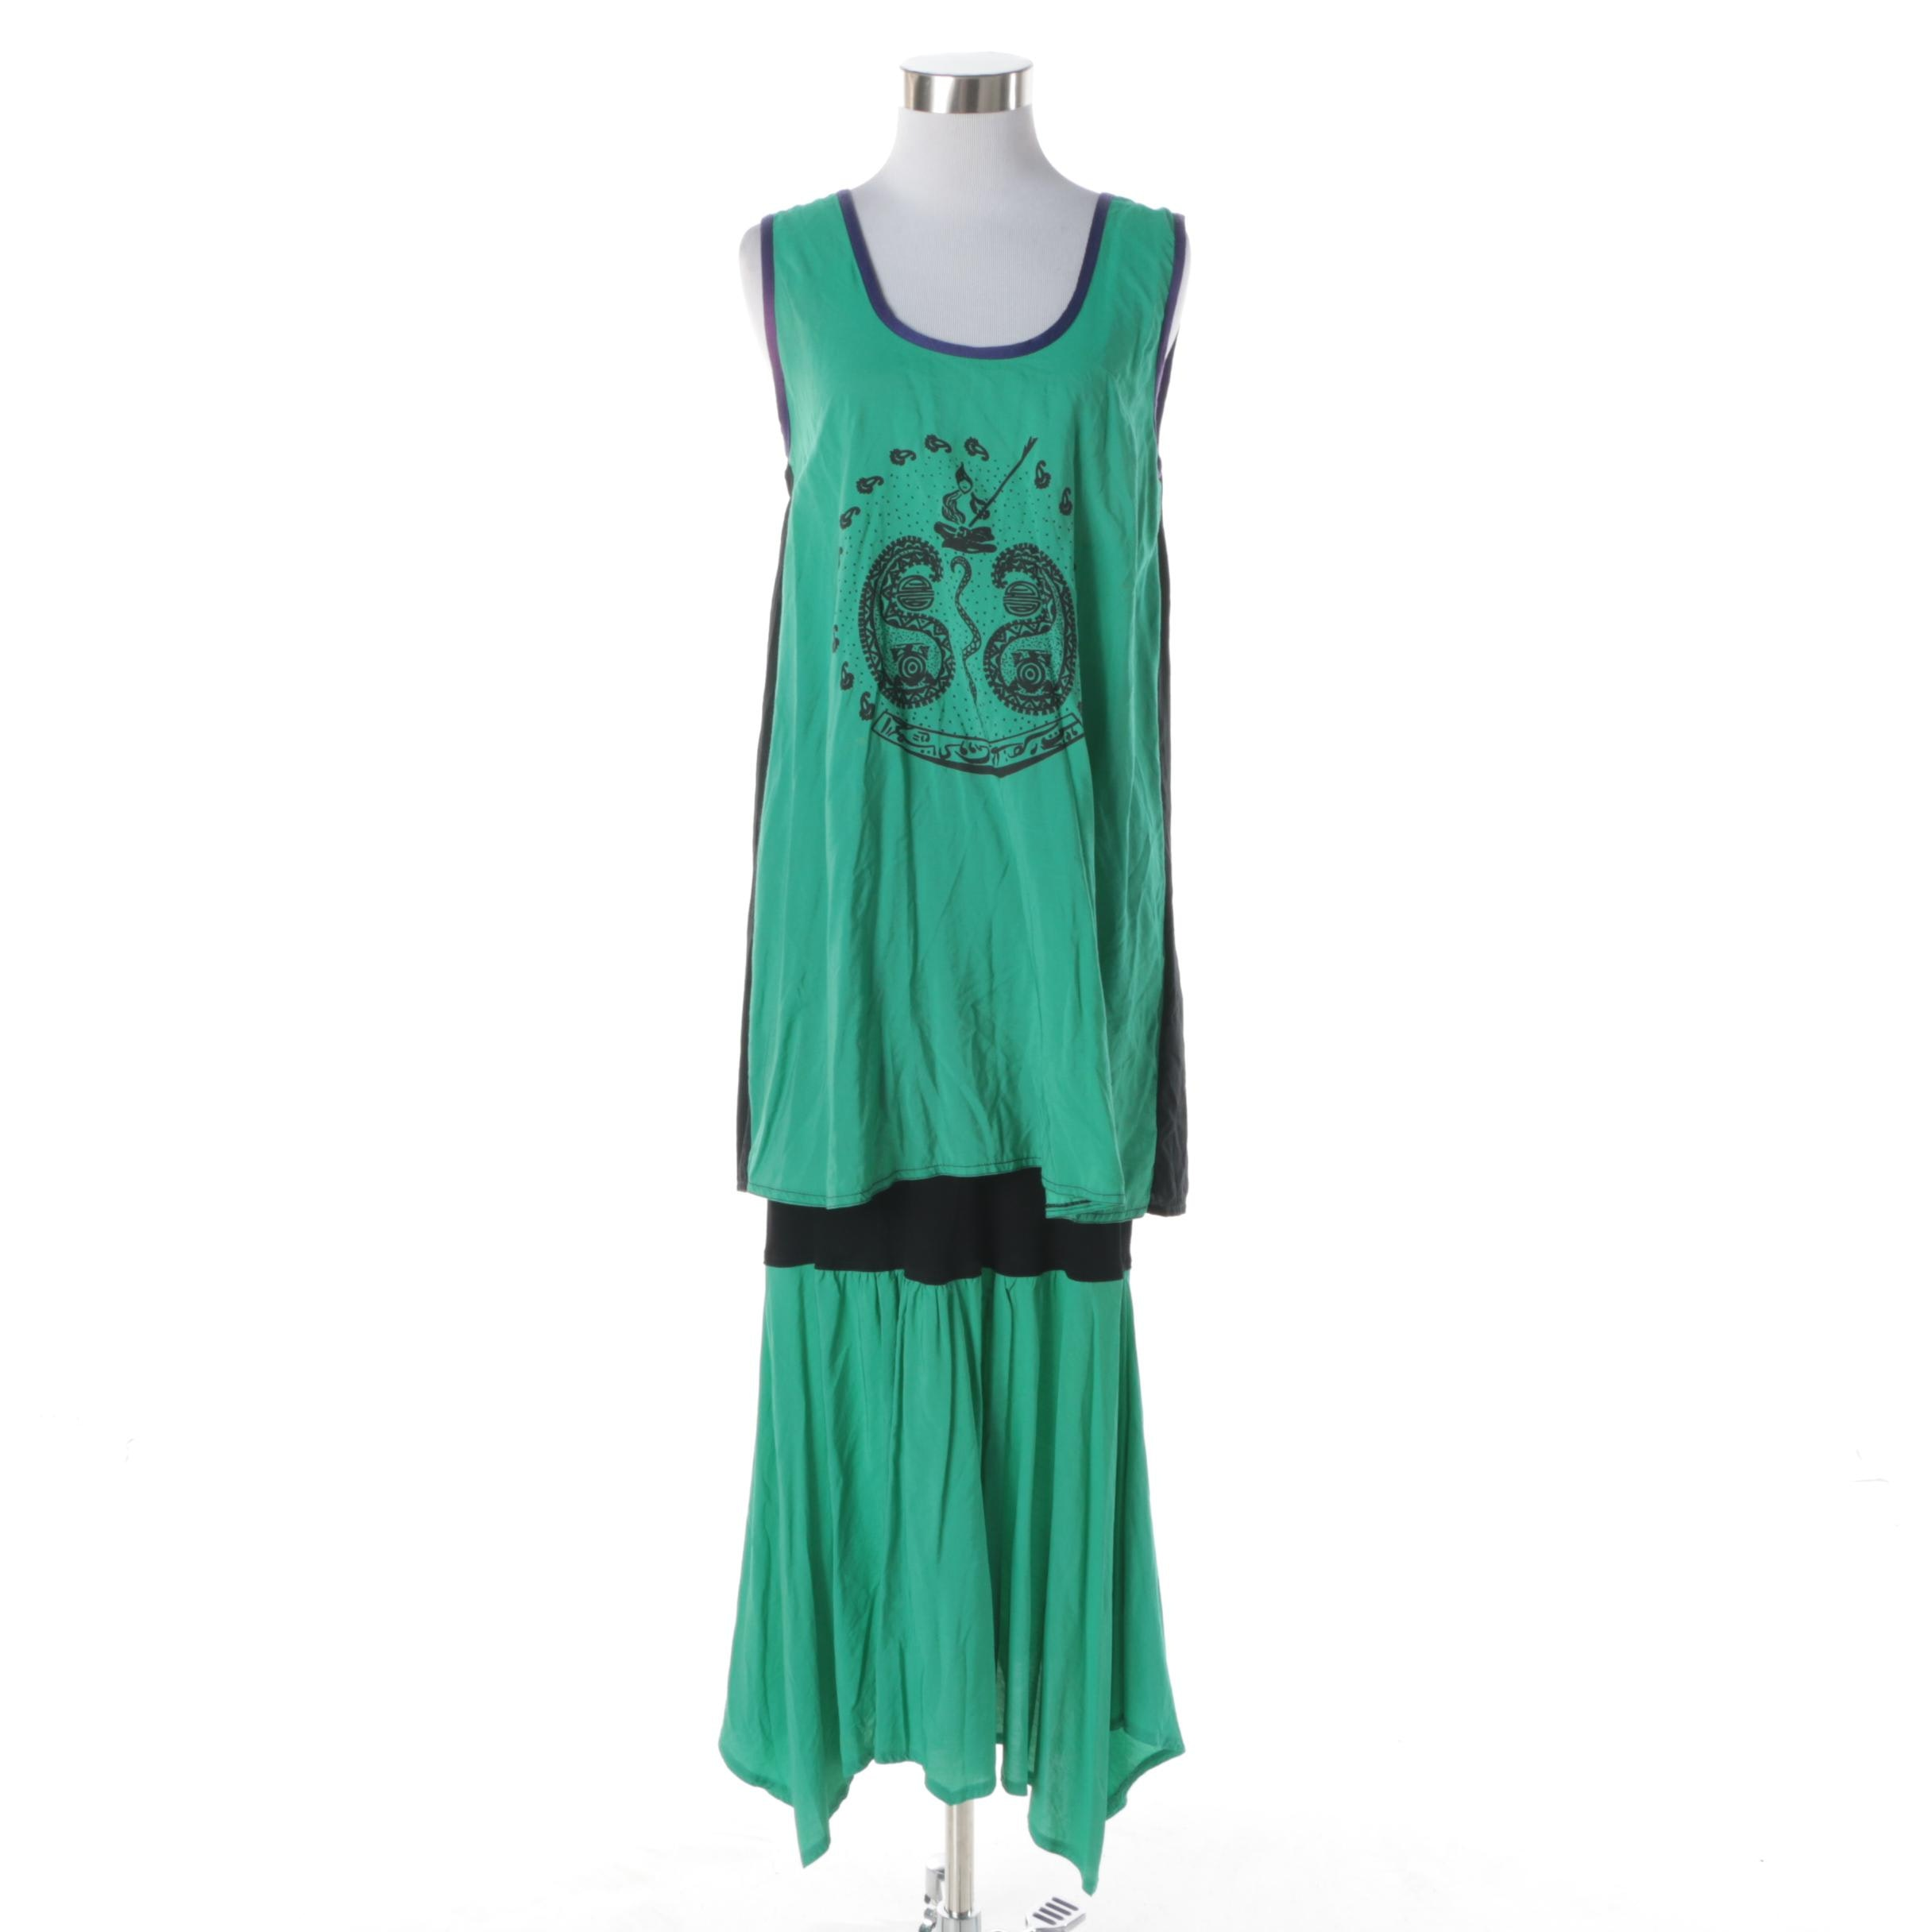 Creola Green and Black Silk Sleeveless Dress